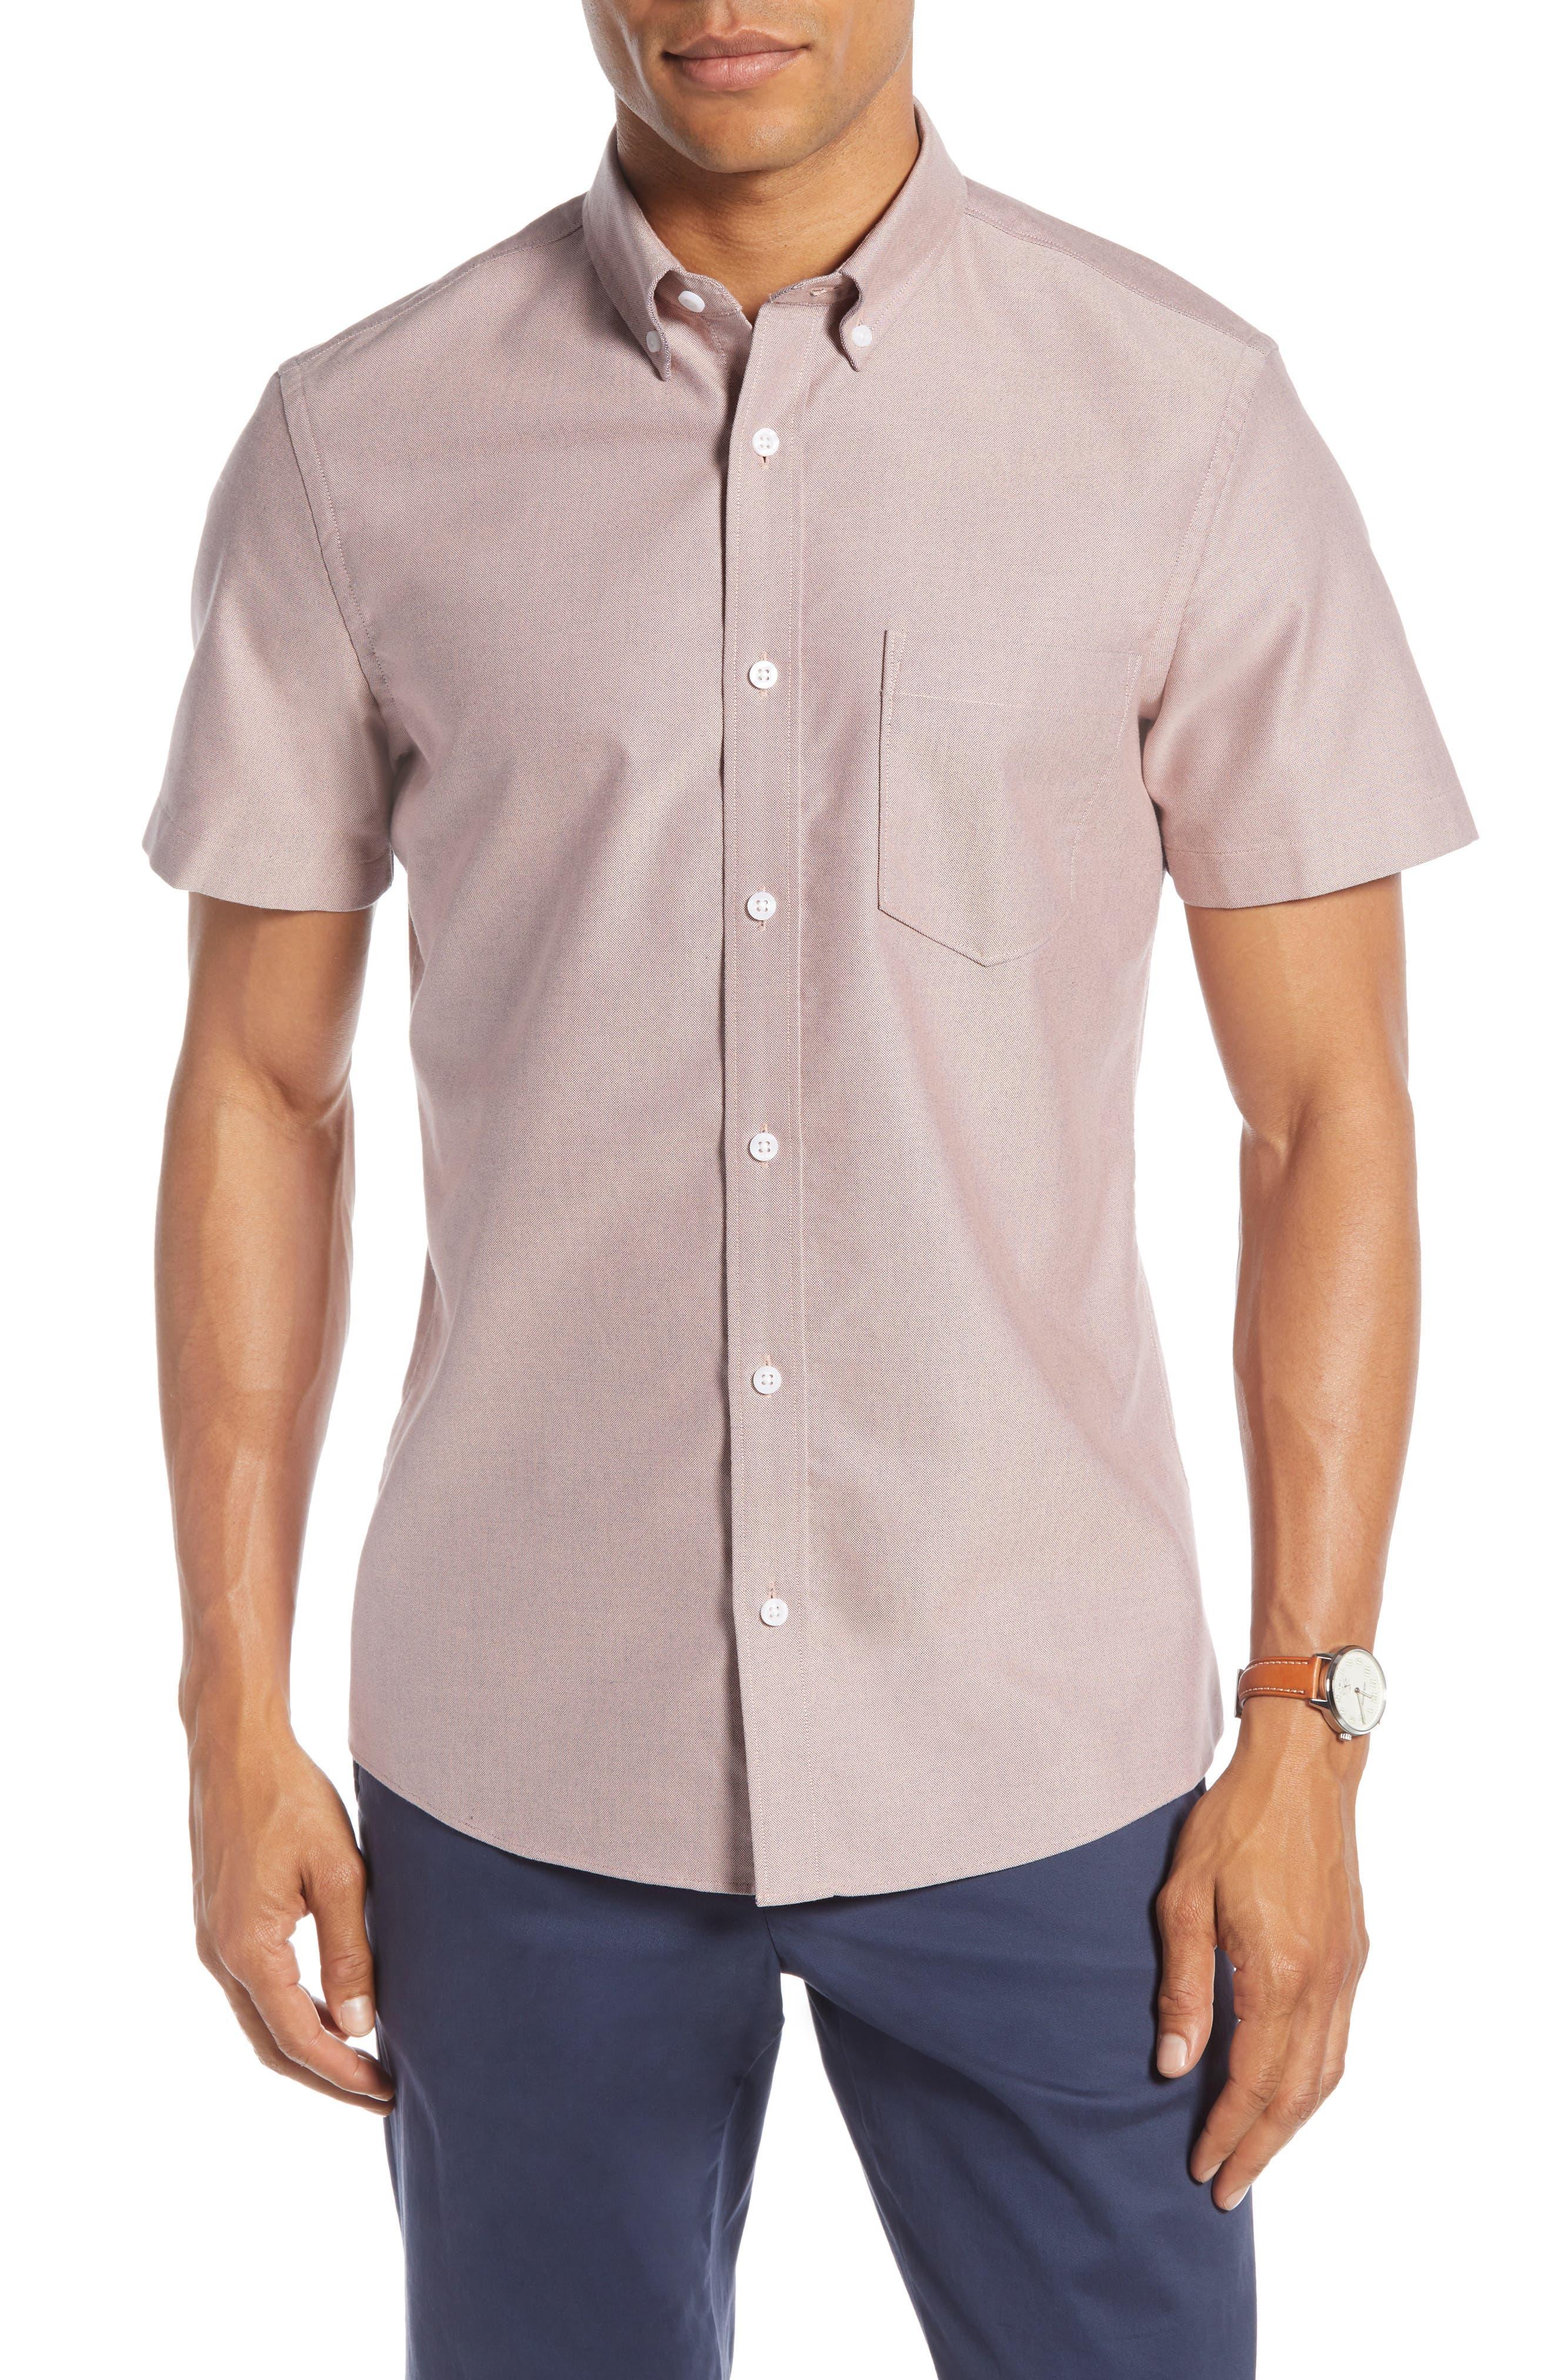 1901 Solid Slim Fit Sport Shirt